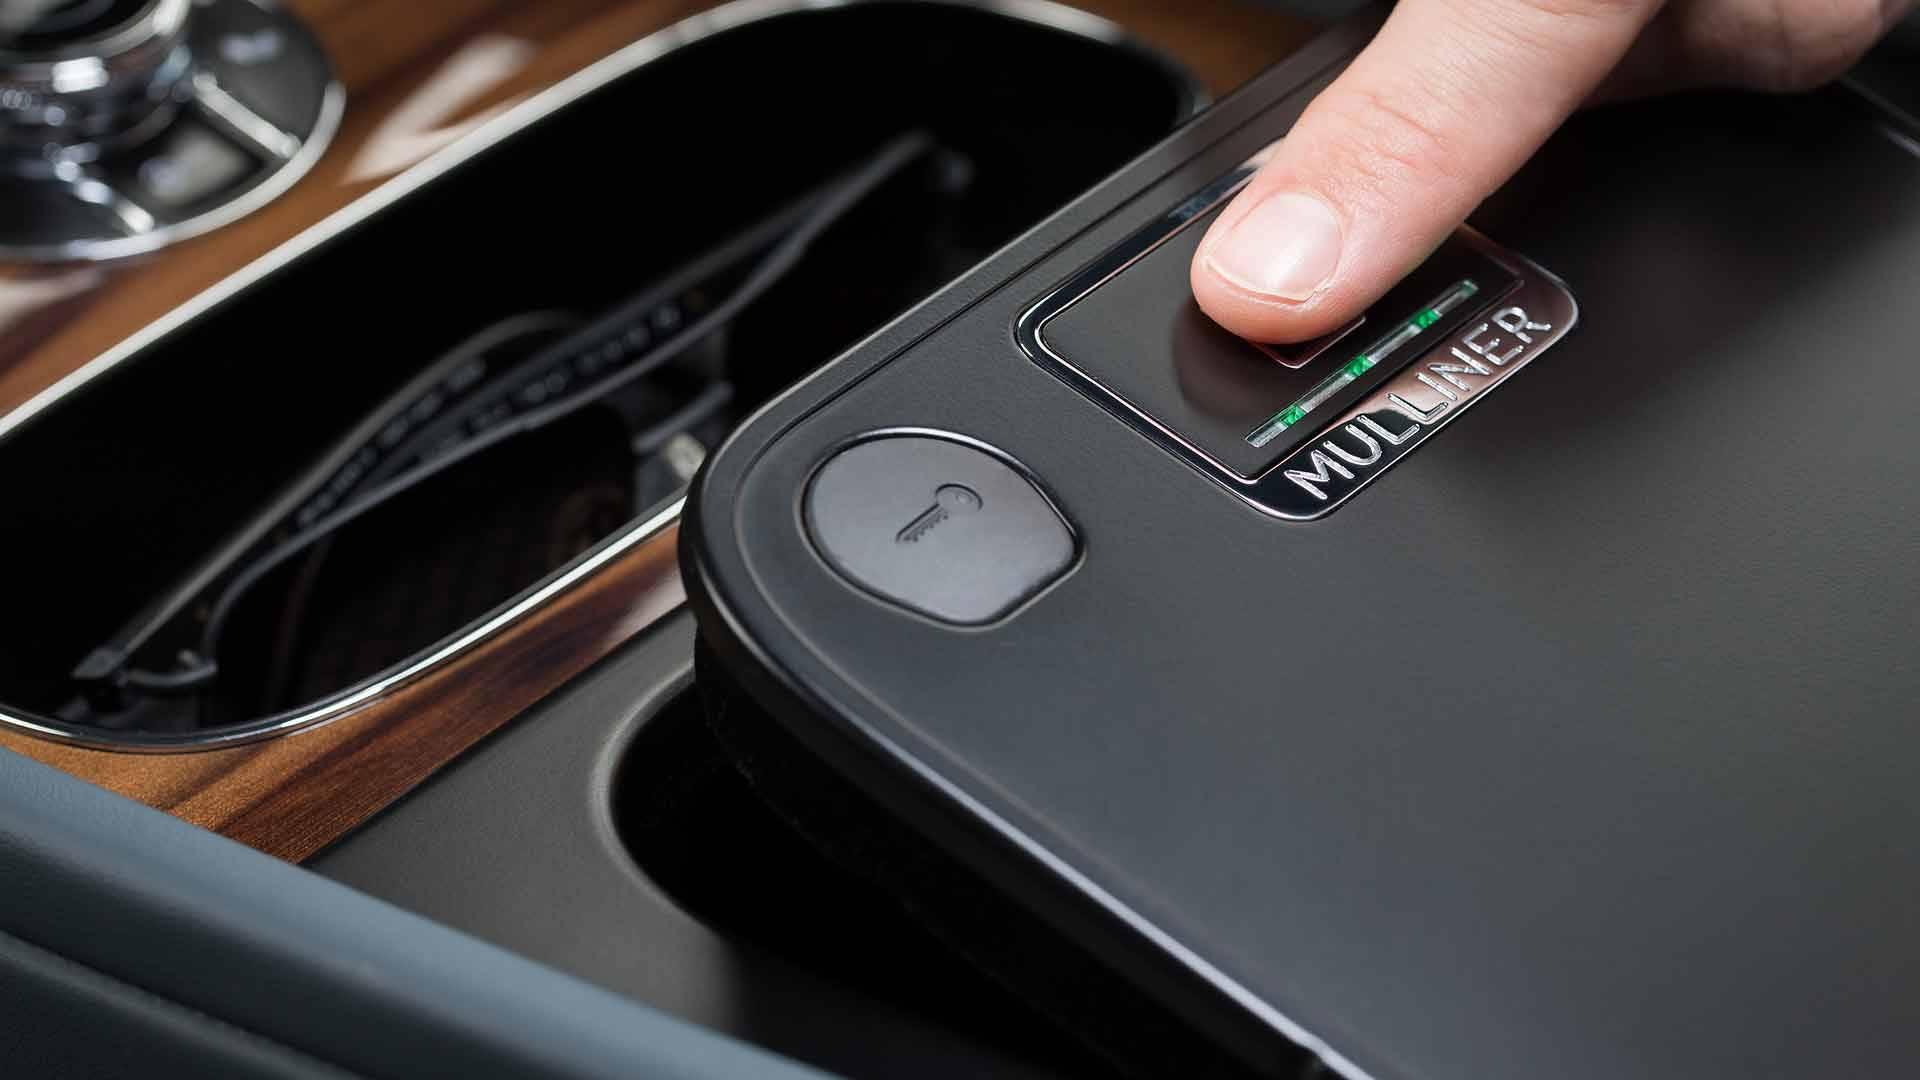 Bentley Bentayga Gets Fingerprint Scanner For Hiding Valuables